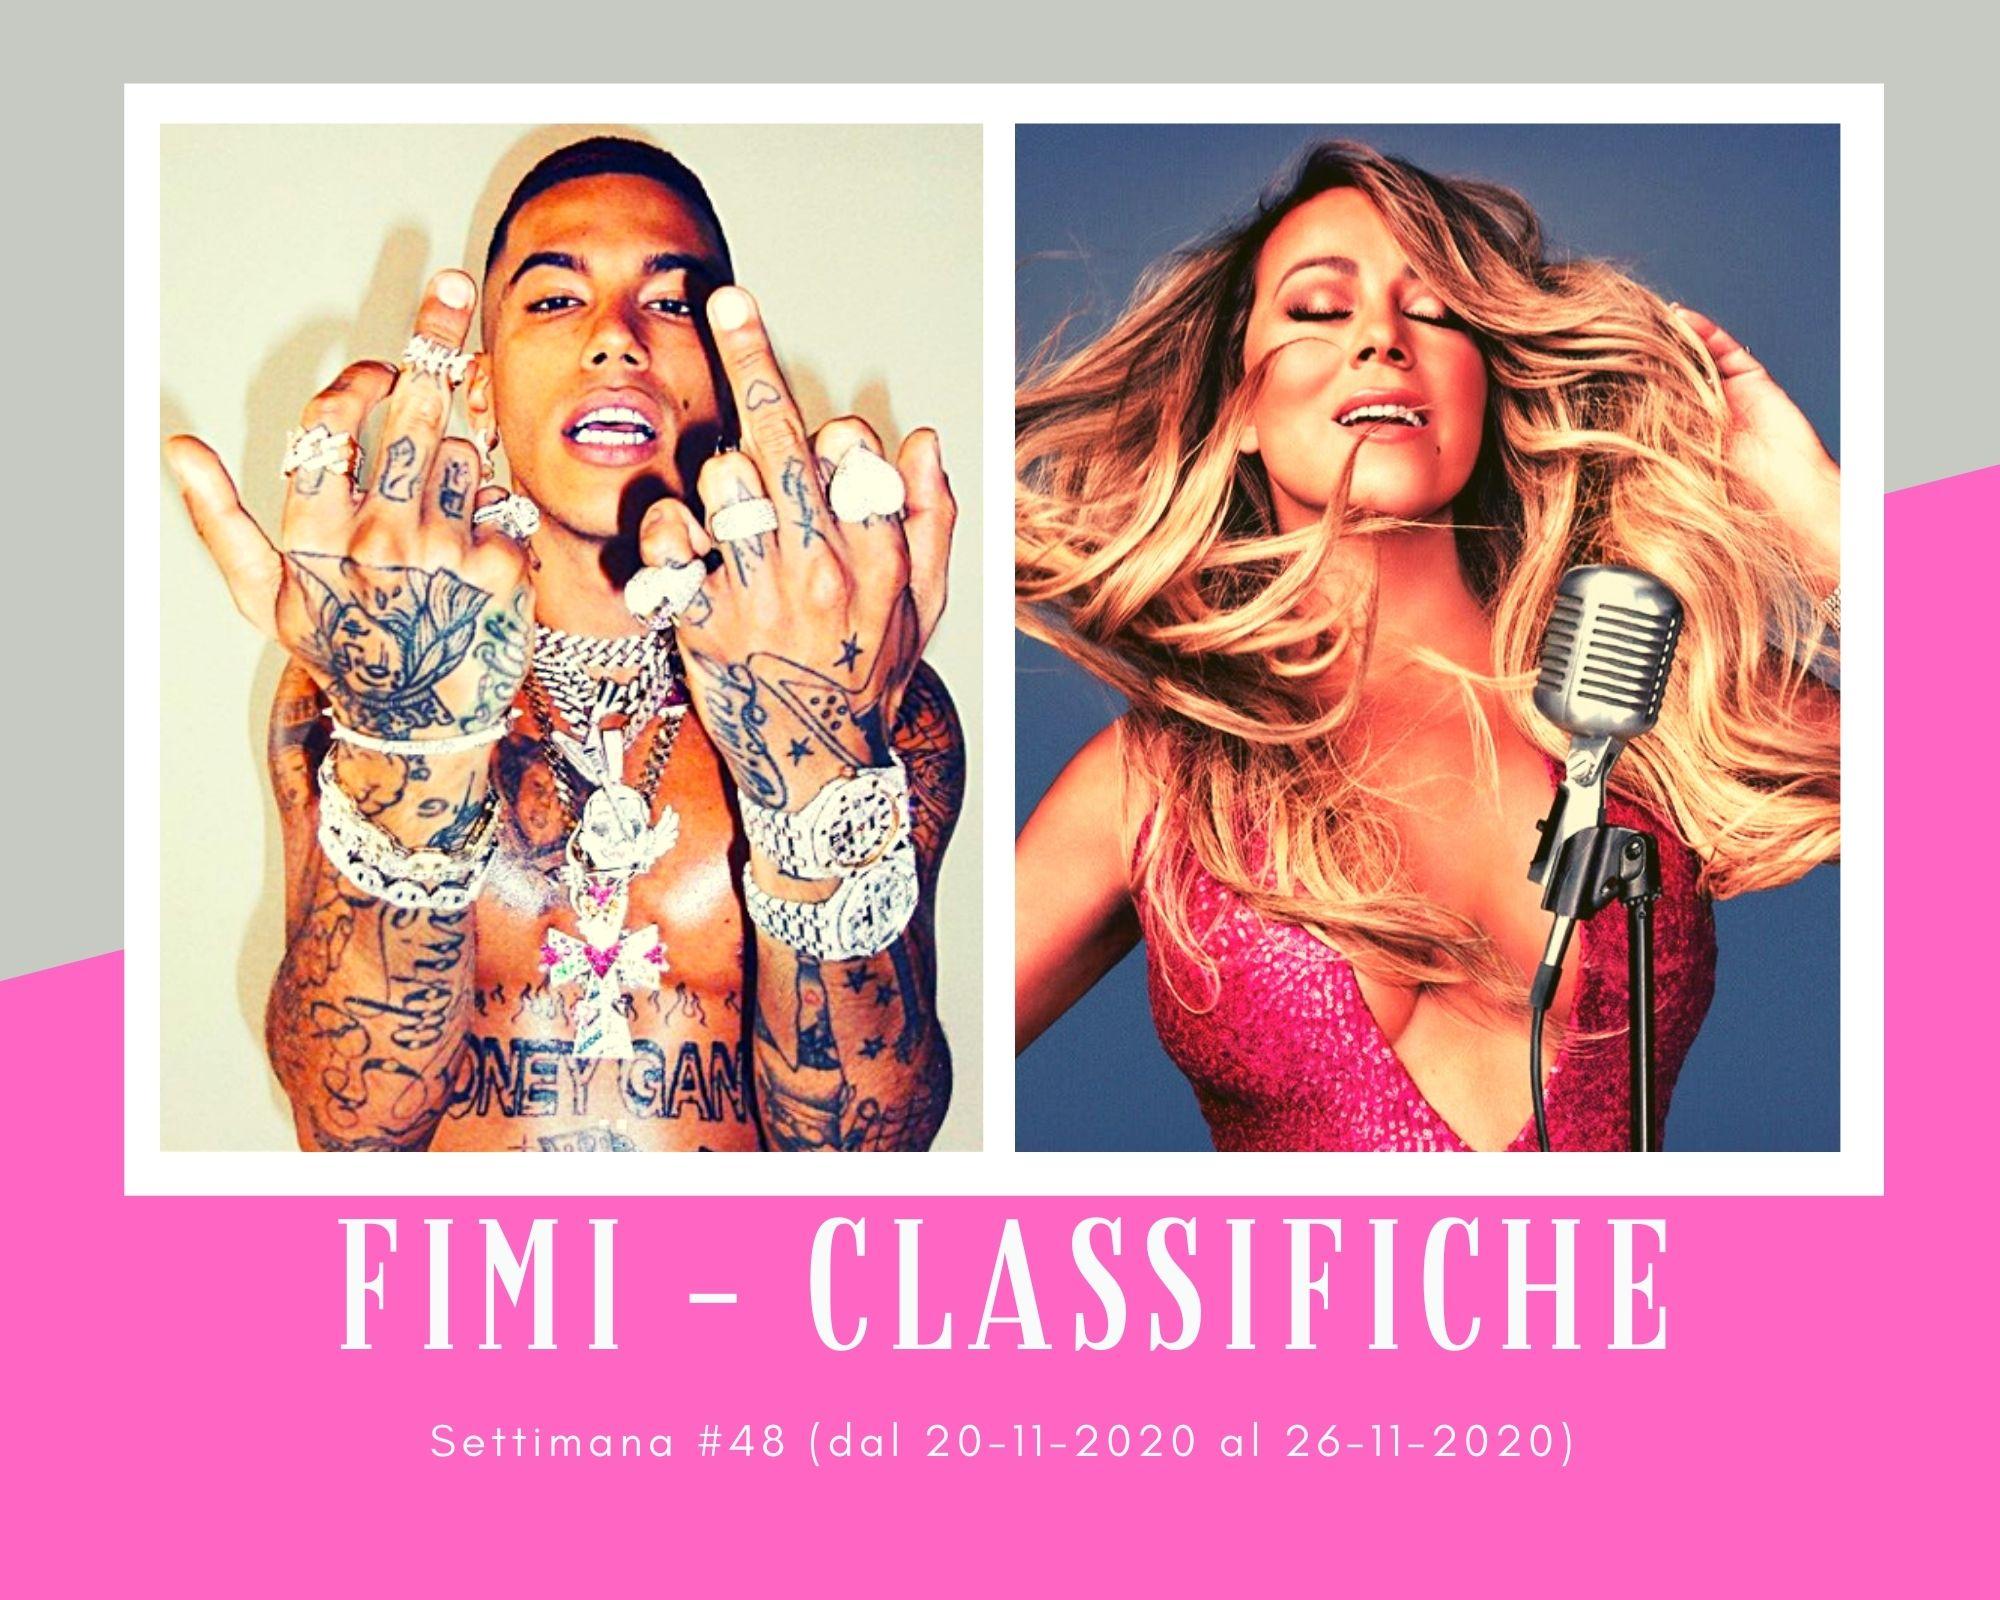 Classifiche FIMI, week 48. Sfera Ebbasta spazza via tutti. Mariah Carey e Taylor Swift primedonne